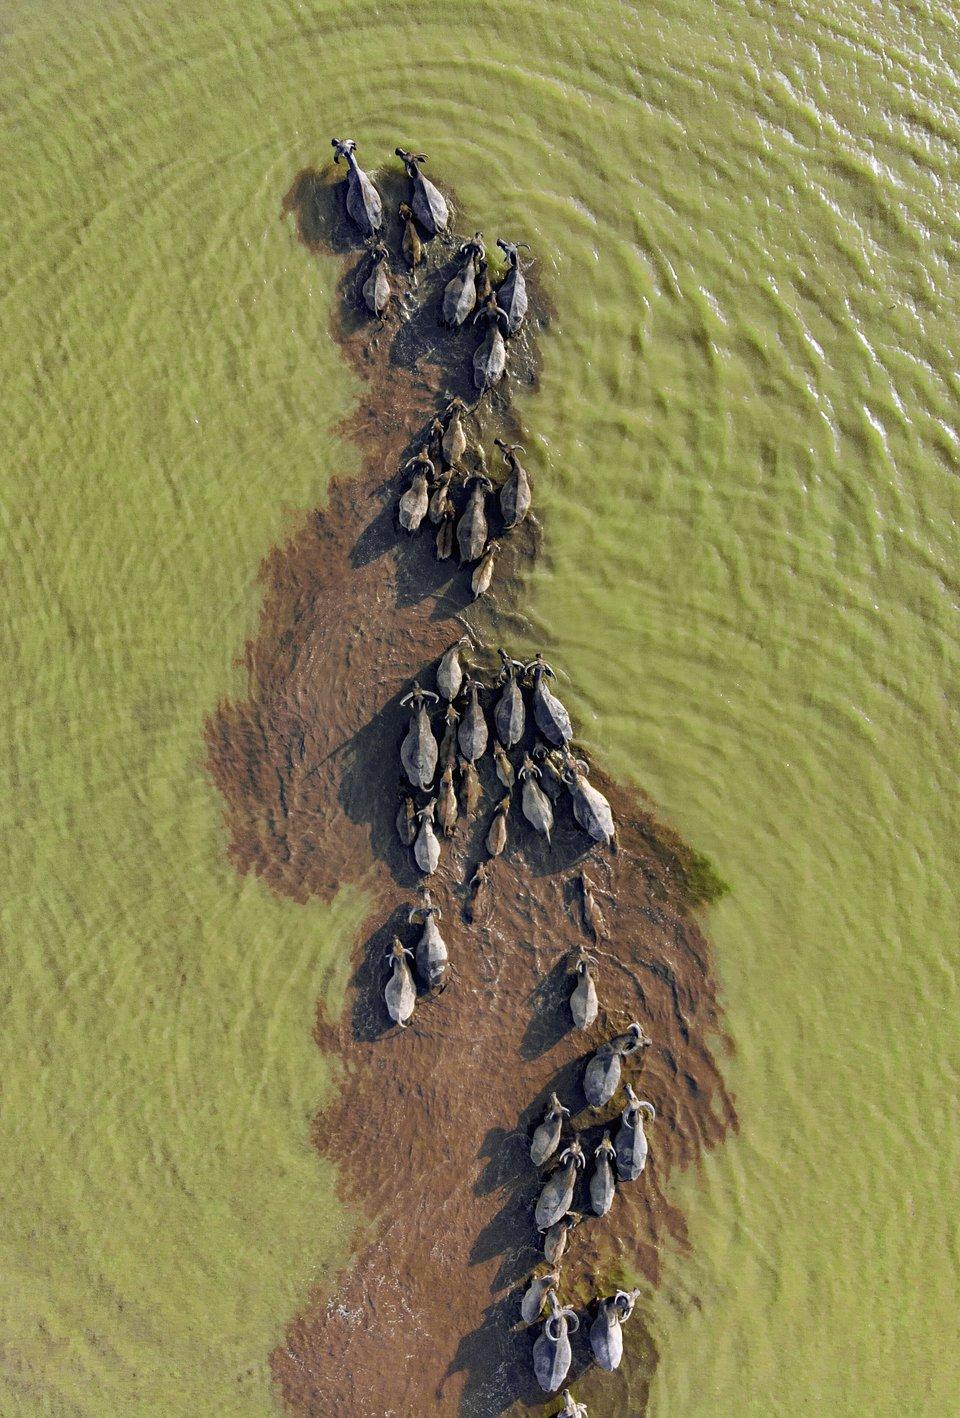 Buffalos bathing in Pleiku, central vietnam (Hoang Quocvinh/Agora)